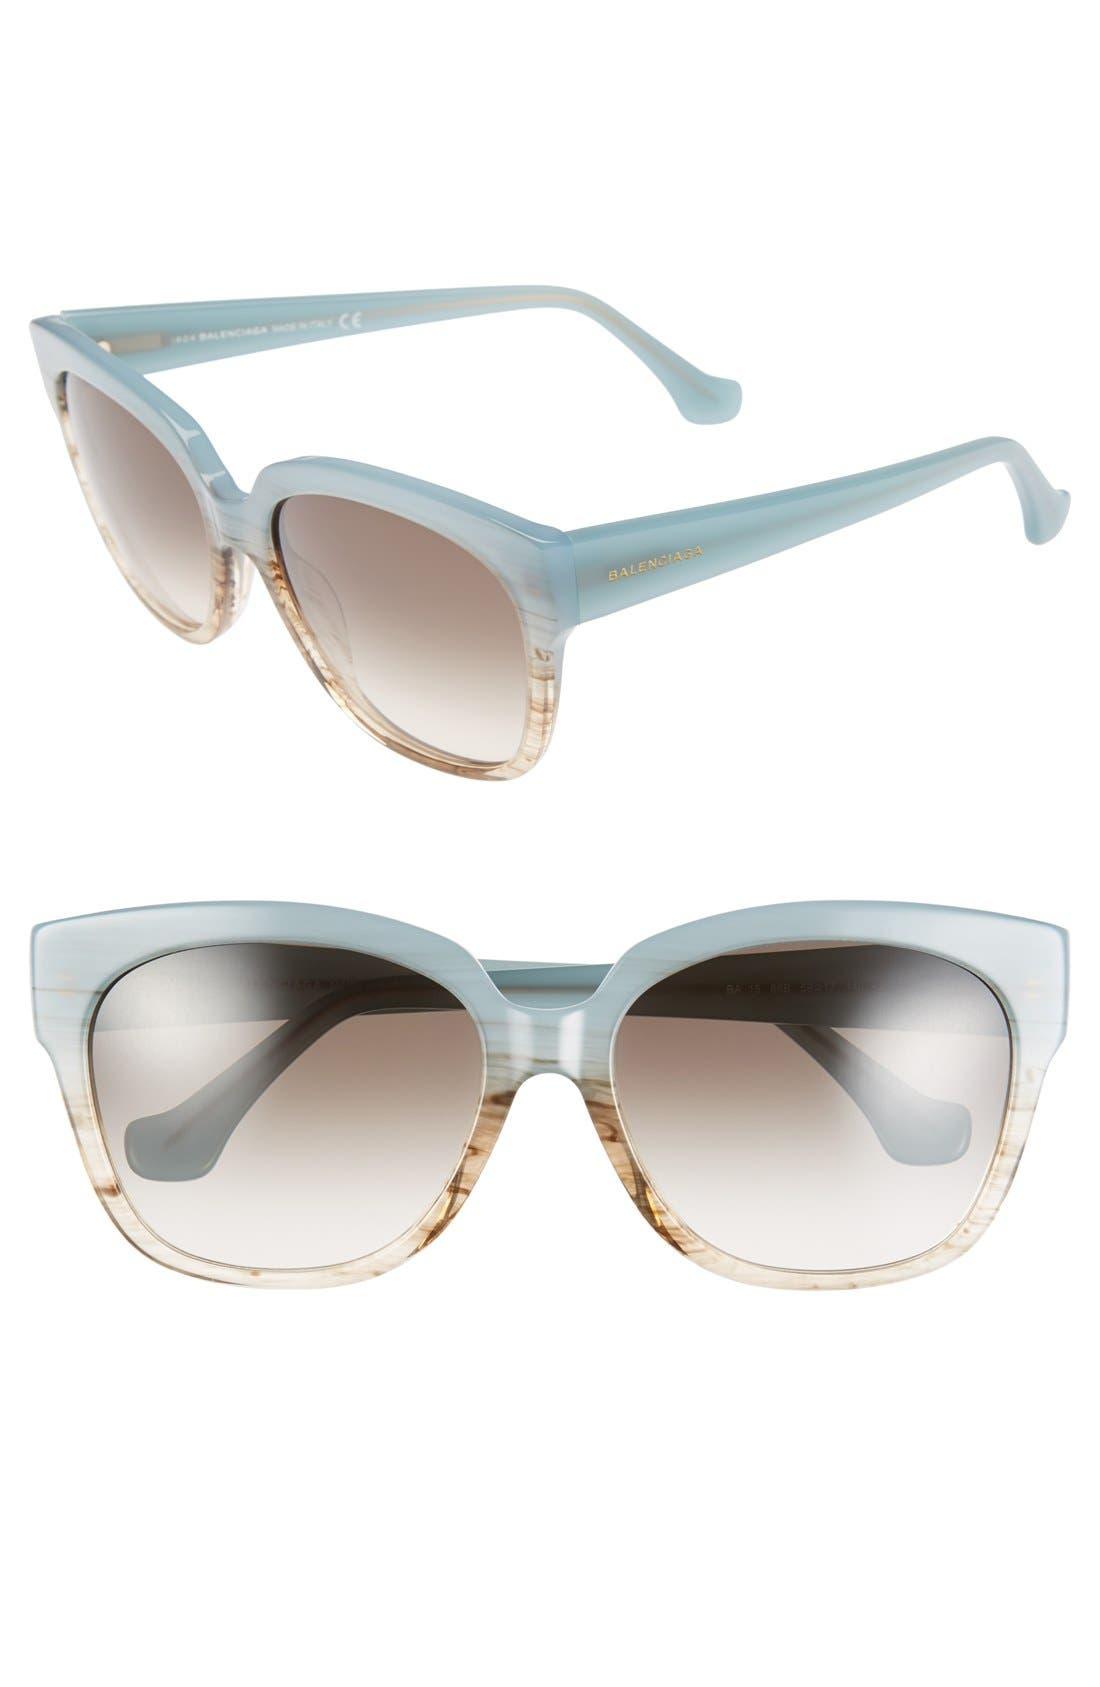 Alternate Image 1 Selected - Balenciaga Paris 59mm 'BA0015' Sunglasses